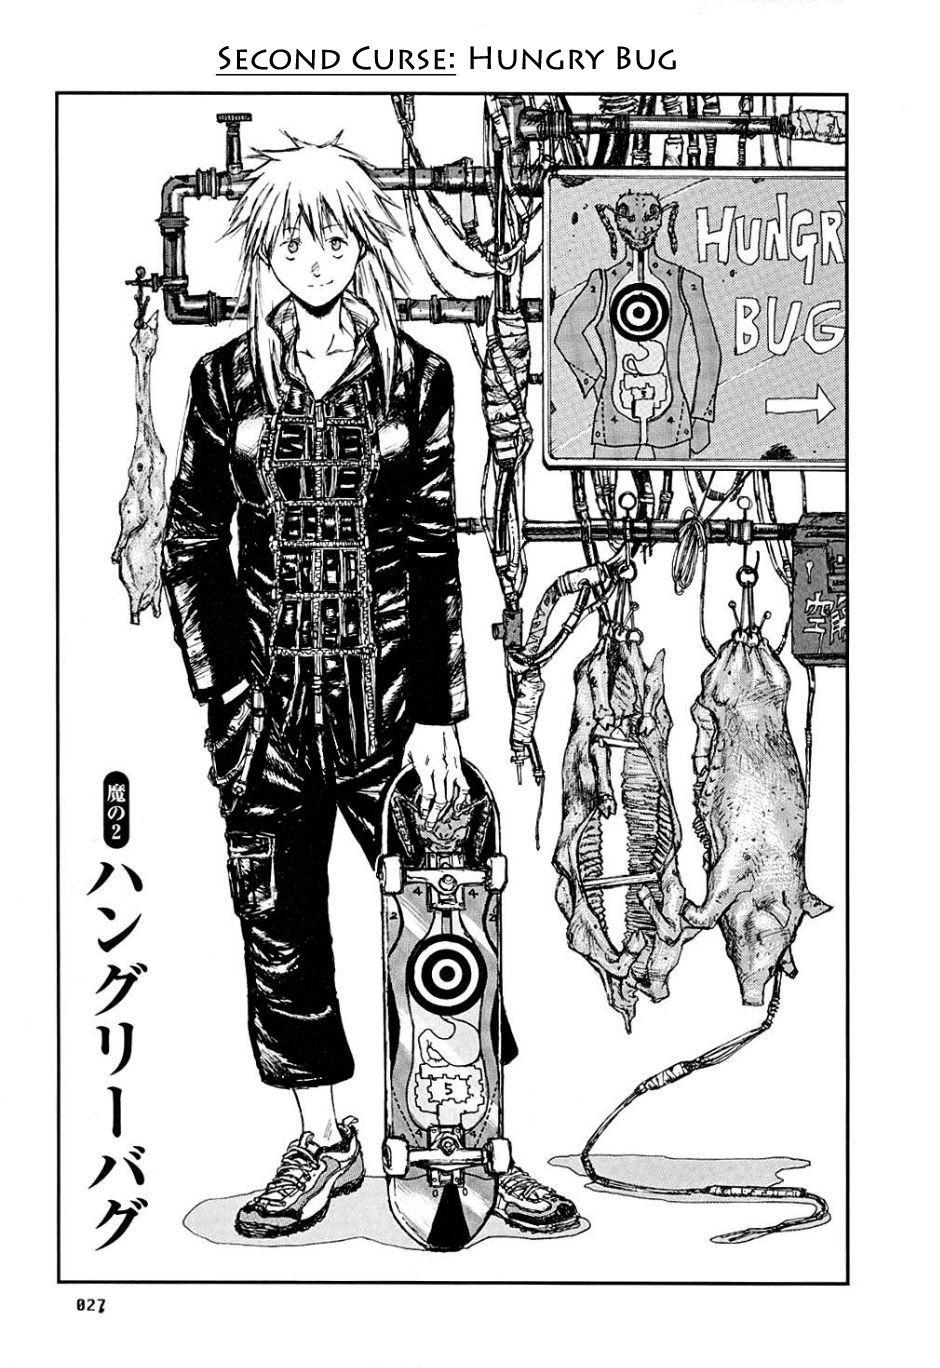 Read manga Dorohedoro 002 Hungry Bug online in high